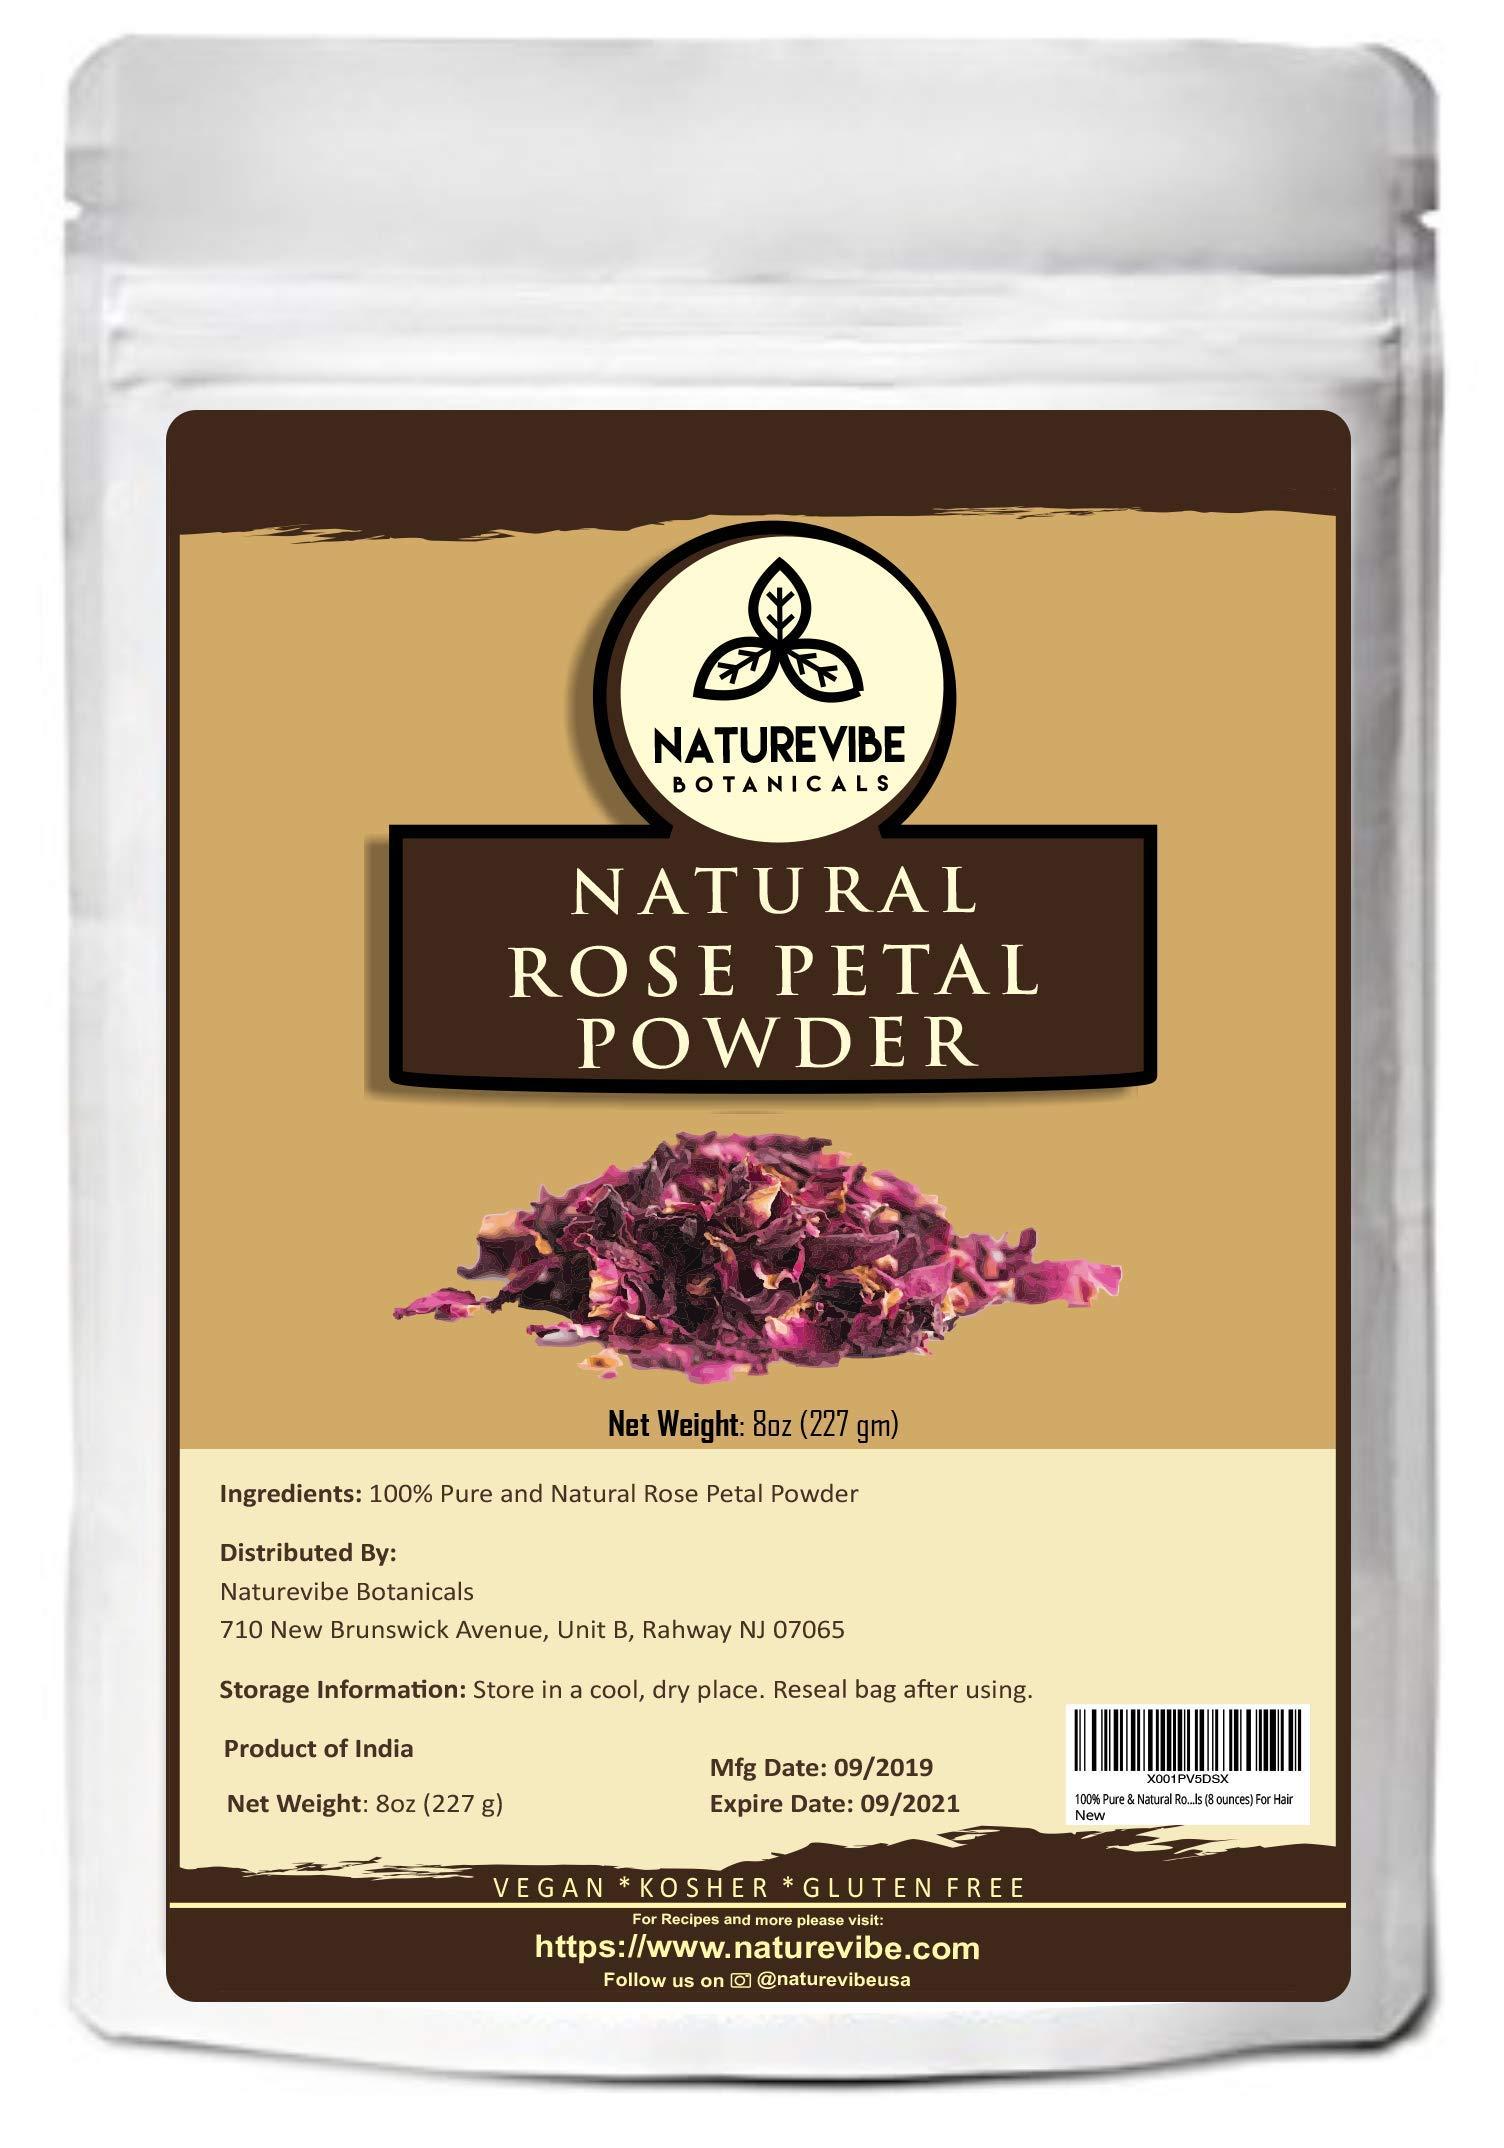 Naturevibe Botanicals 100% Pure & Natural Rose Petal Powder, 8 ounces | Hair and skincare [Packaging may vary]